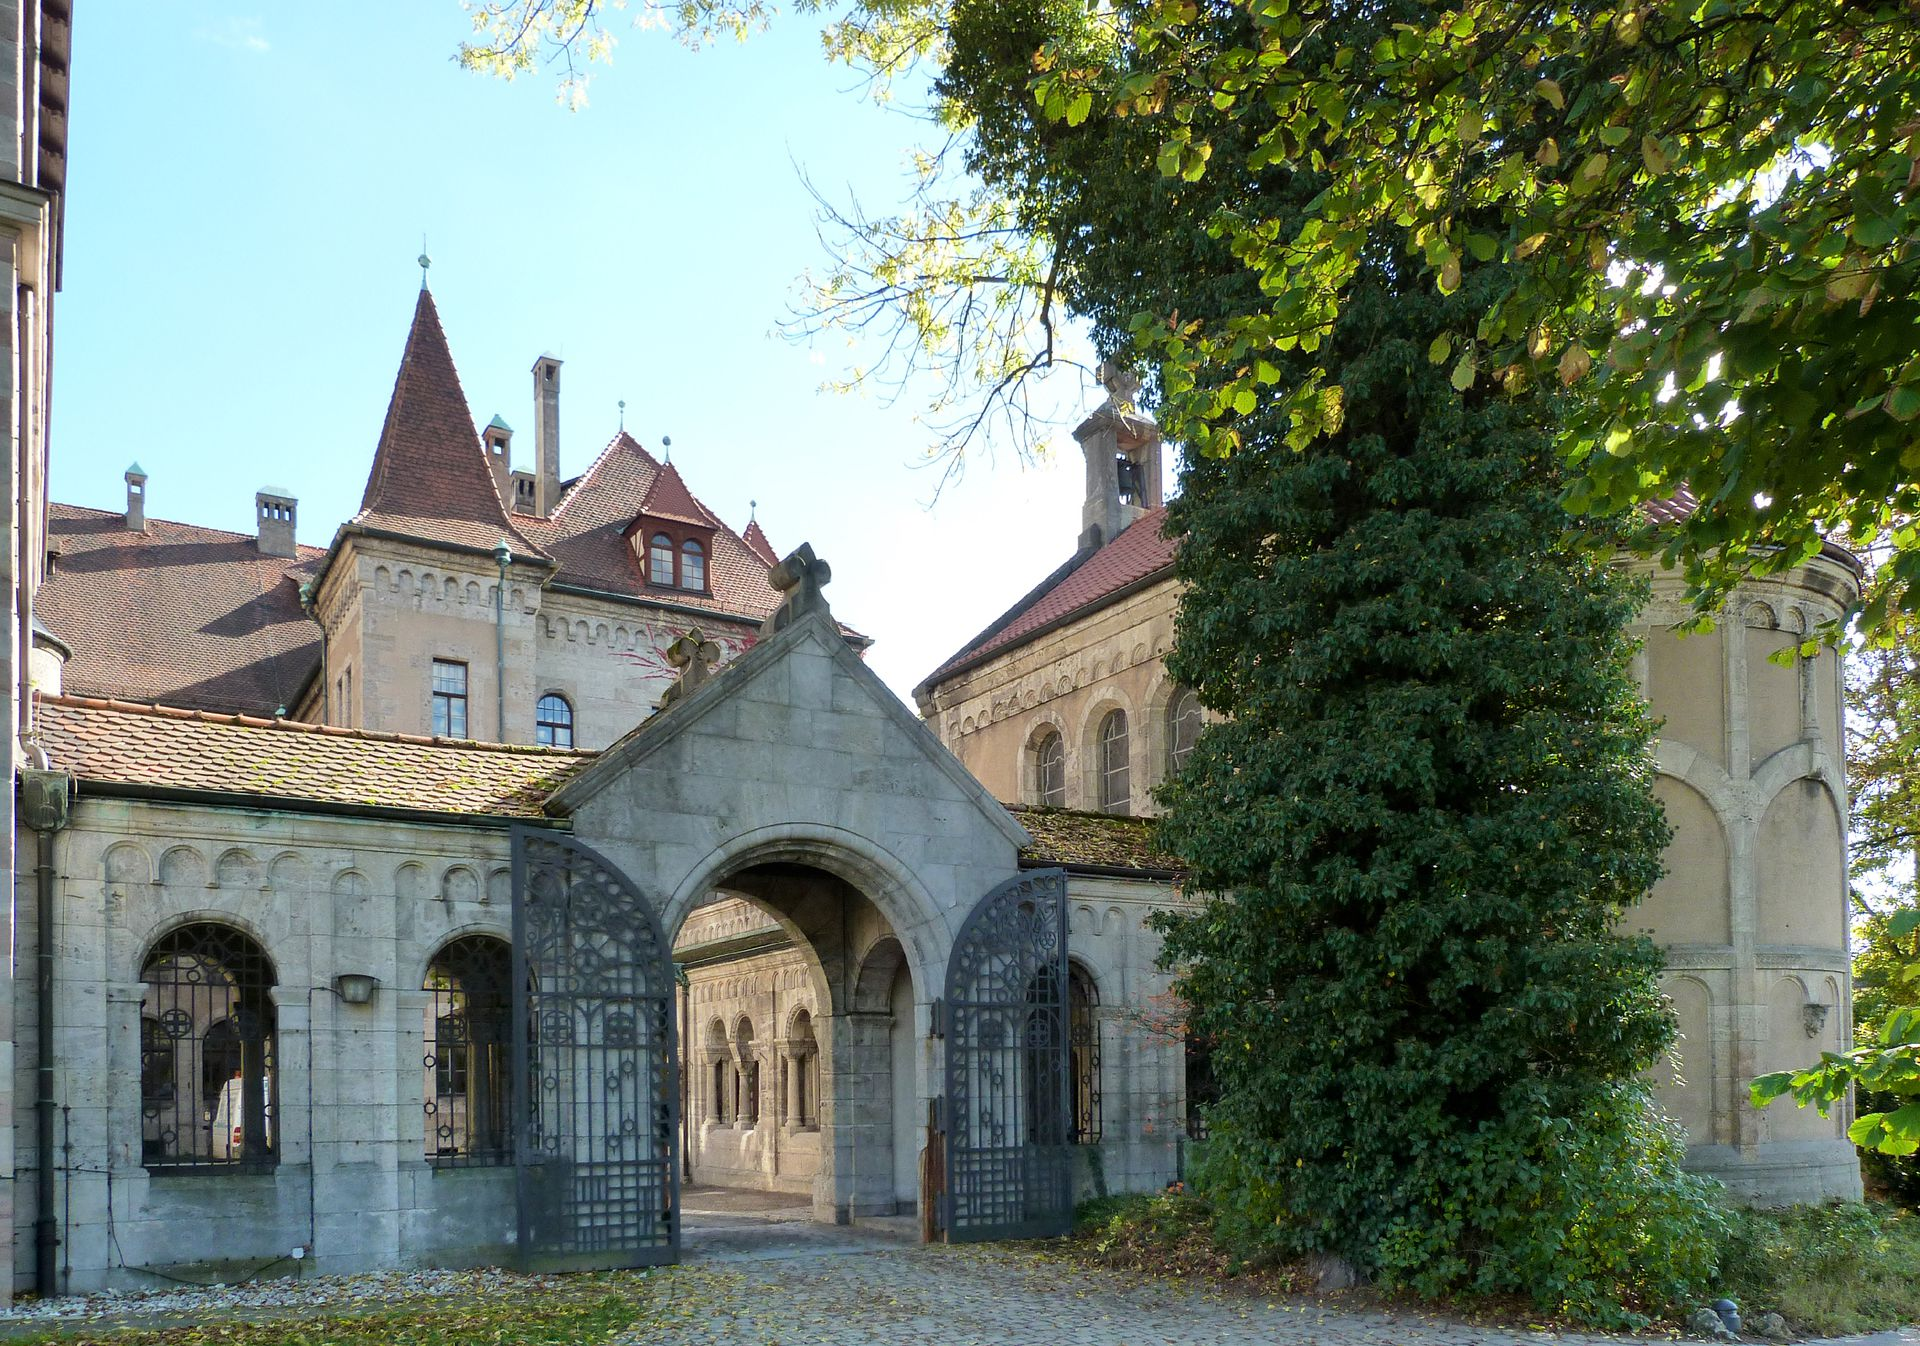 Schloss Faber-Castell Eingang in der Nürnberger Straße